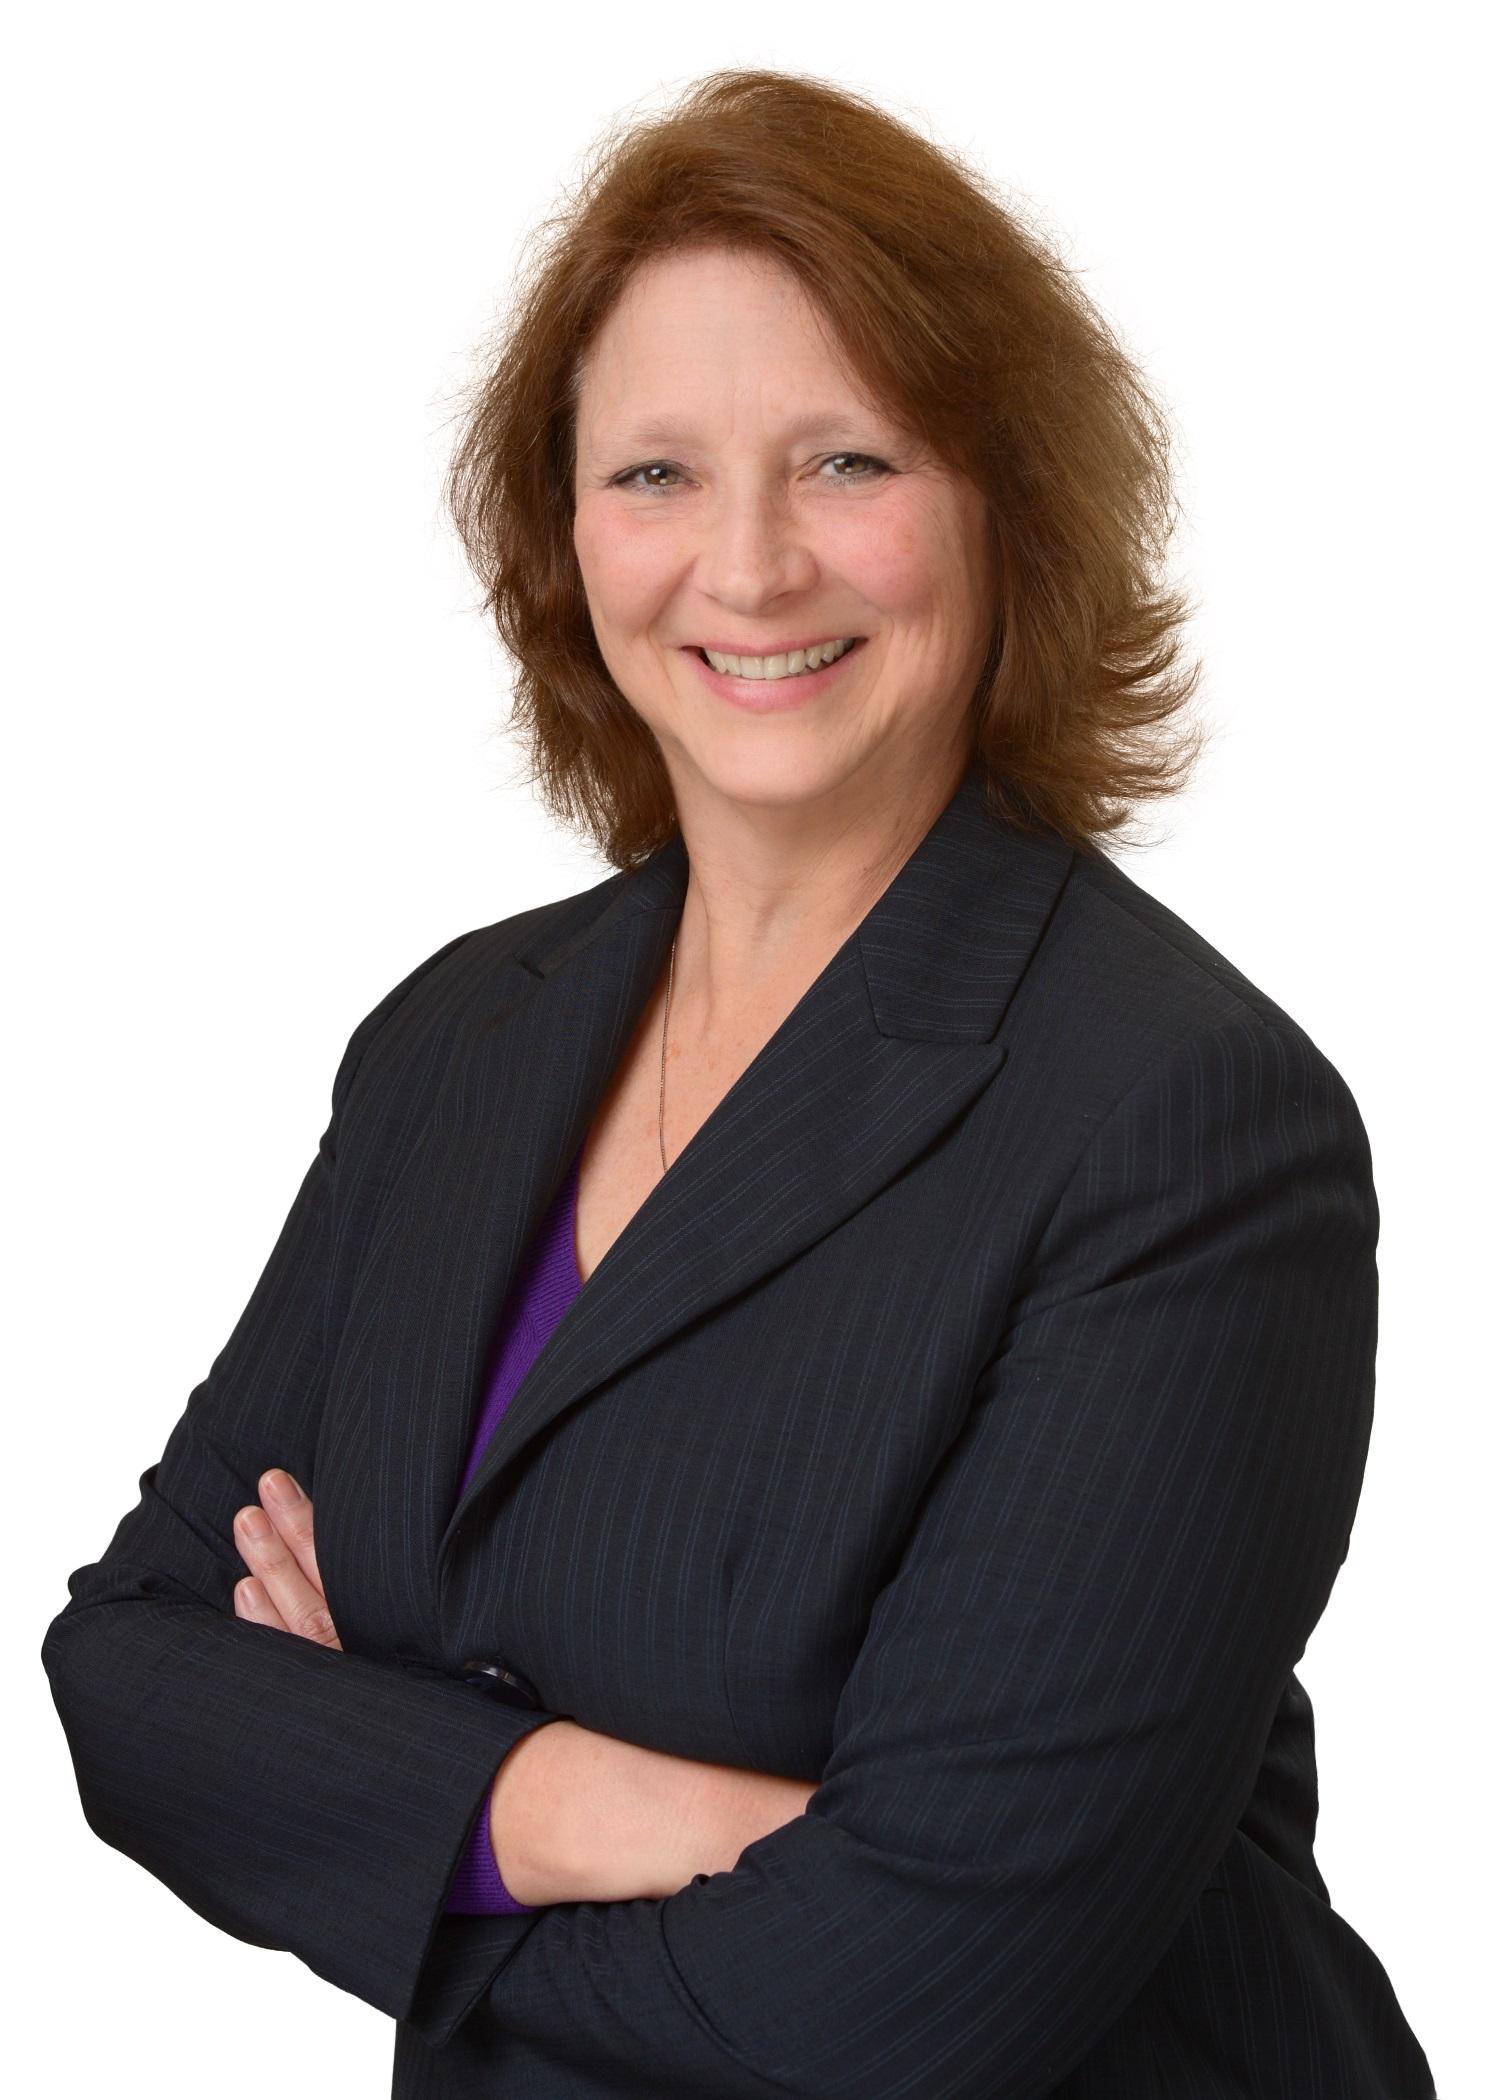 Belva Hale- VP, Business Development